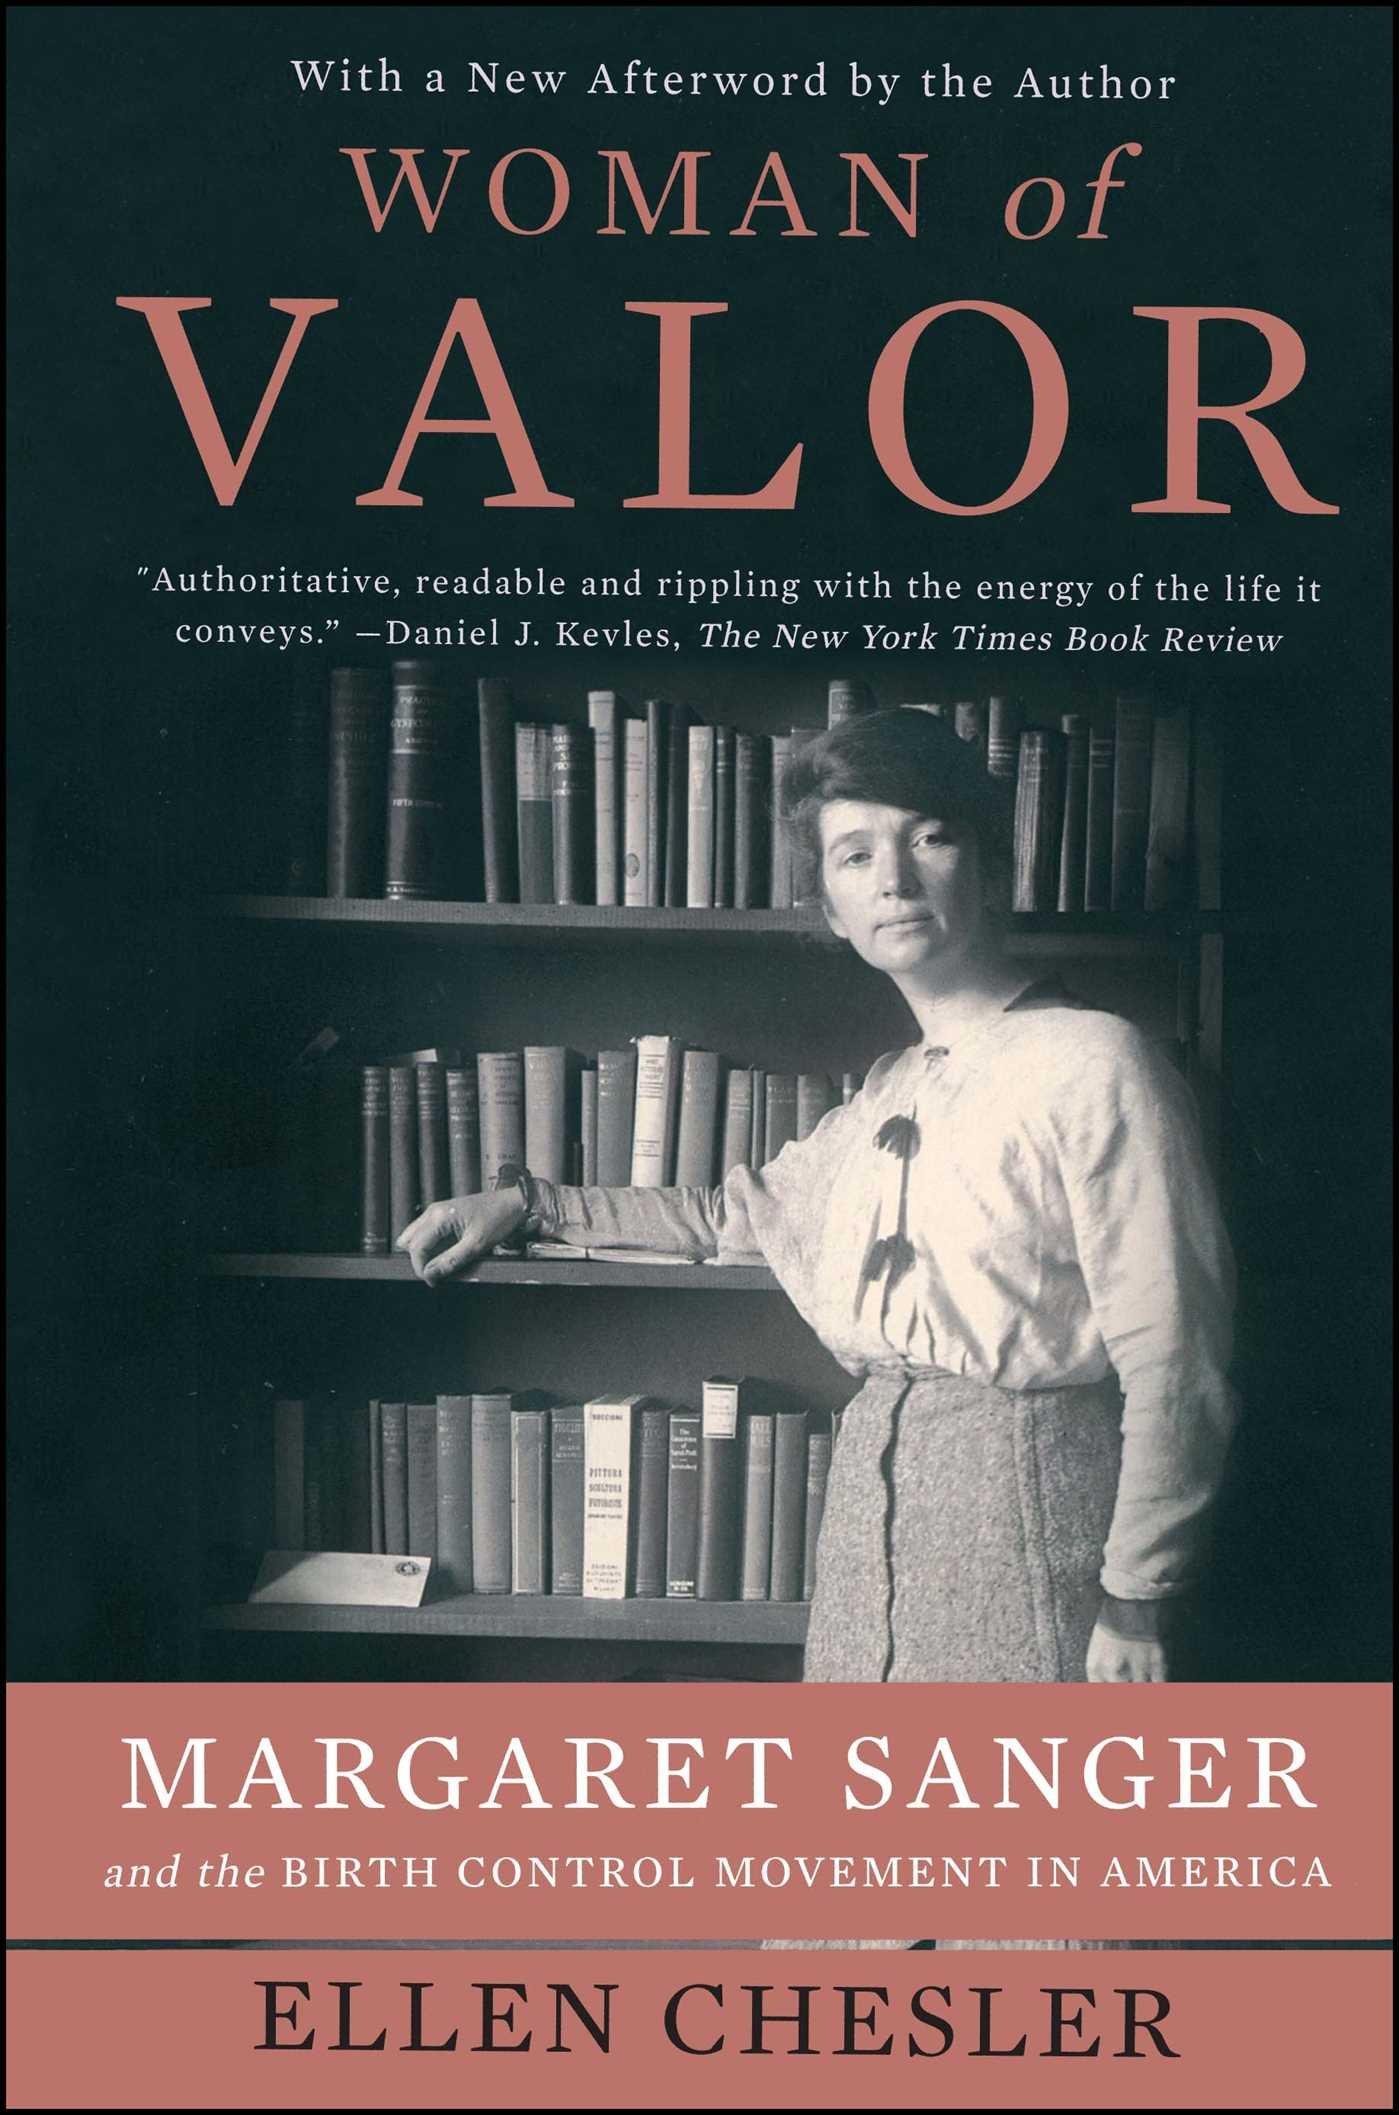 Margaret Sanger: A Life of Passion